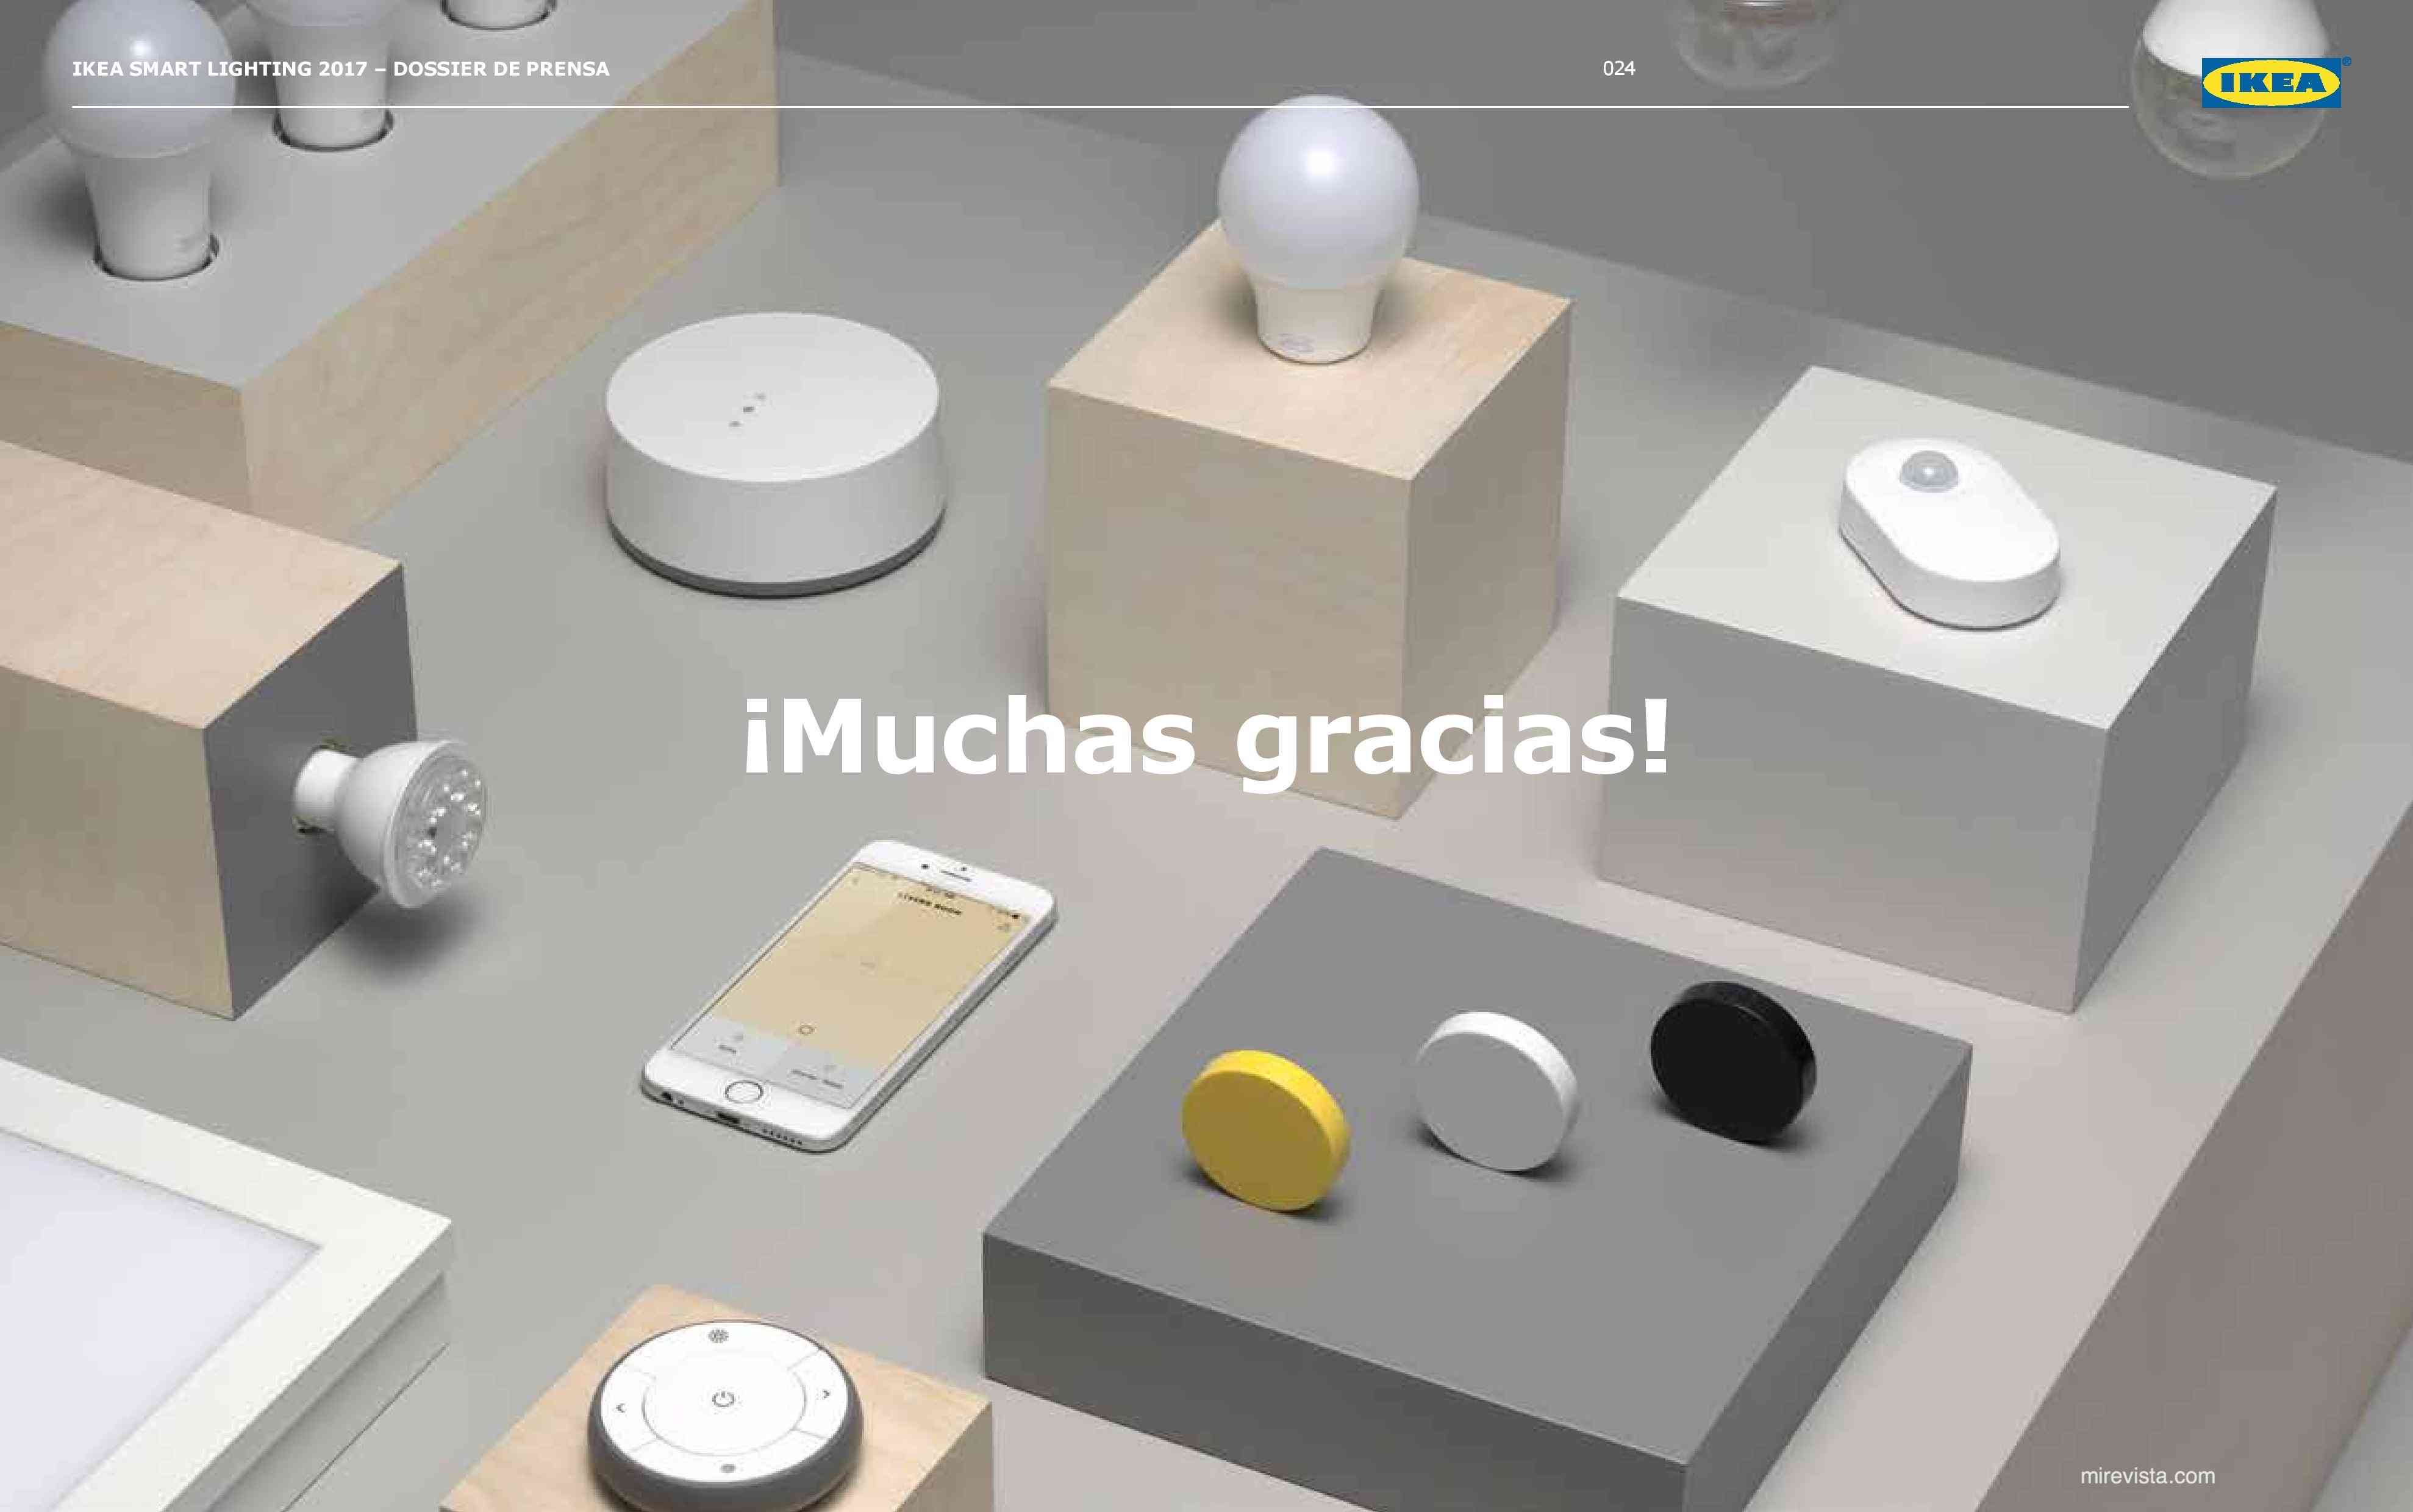 Novedades en iluminación de casas inteligentes con IKEA 80